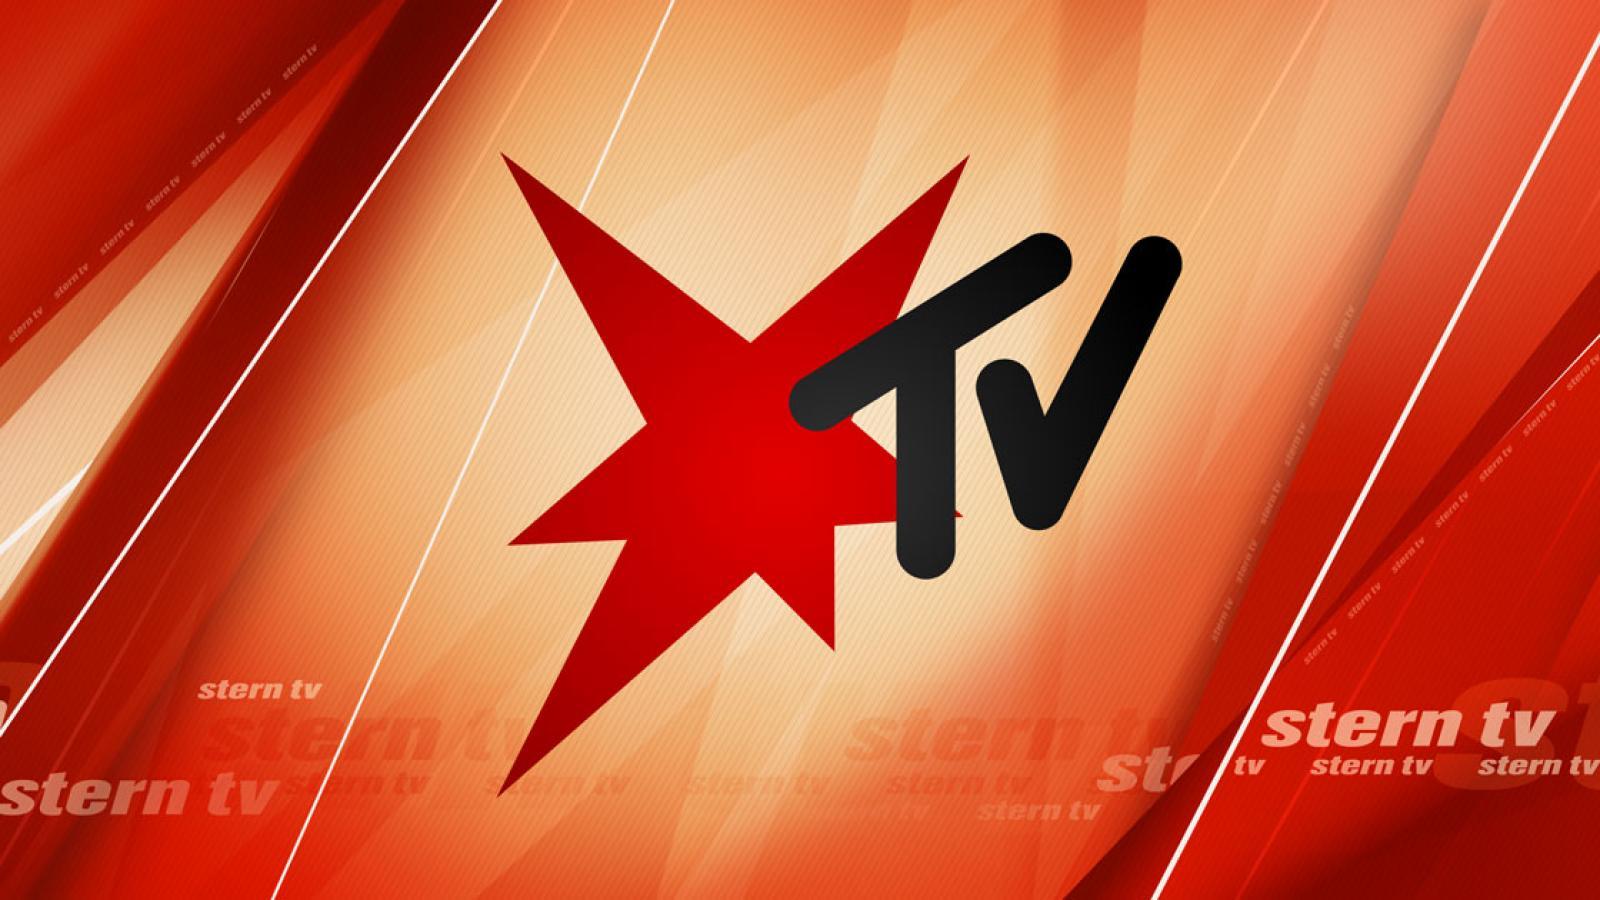 stern TV im Social Web